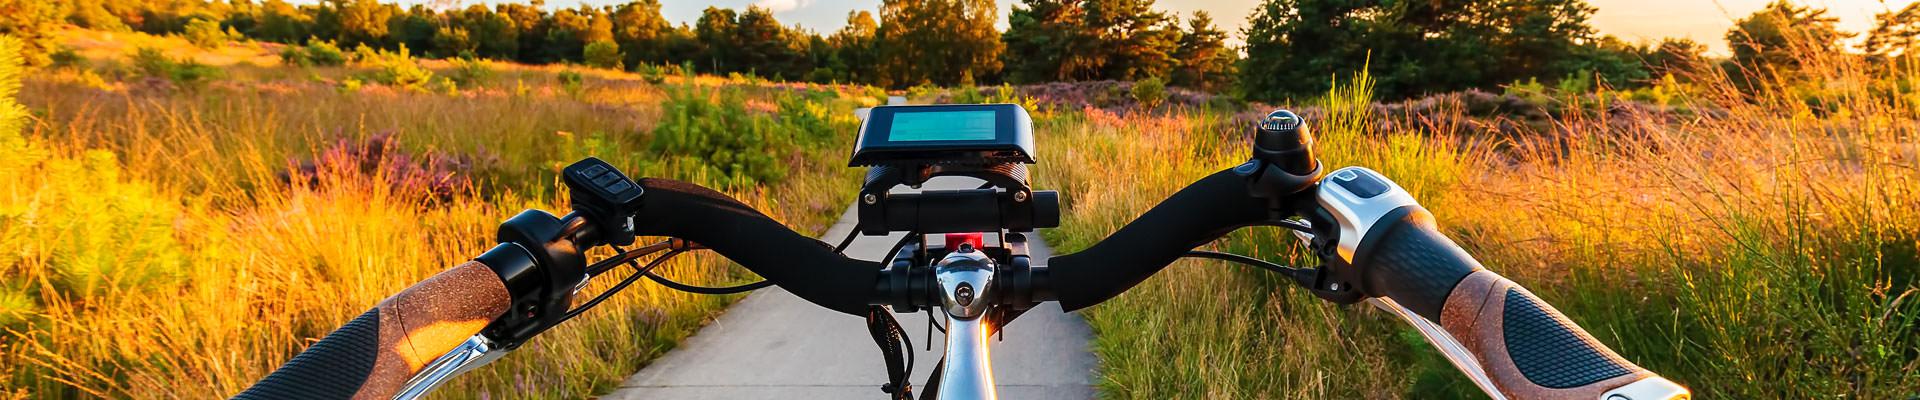 reparatur von e bike akkus eltener fahrradprofi. Black Bedroom Furniture Sets. Home Design Ideas